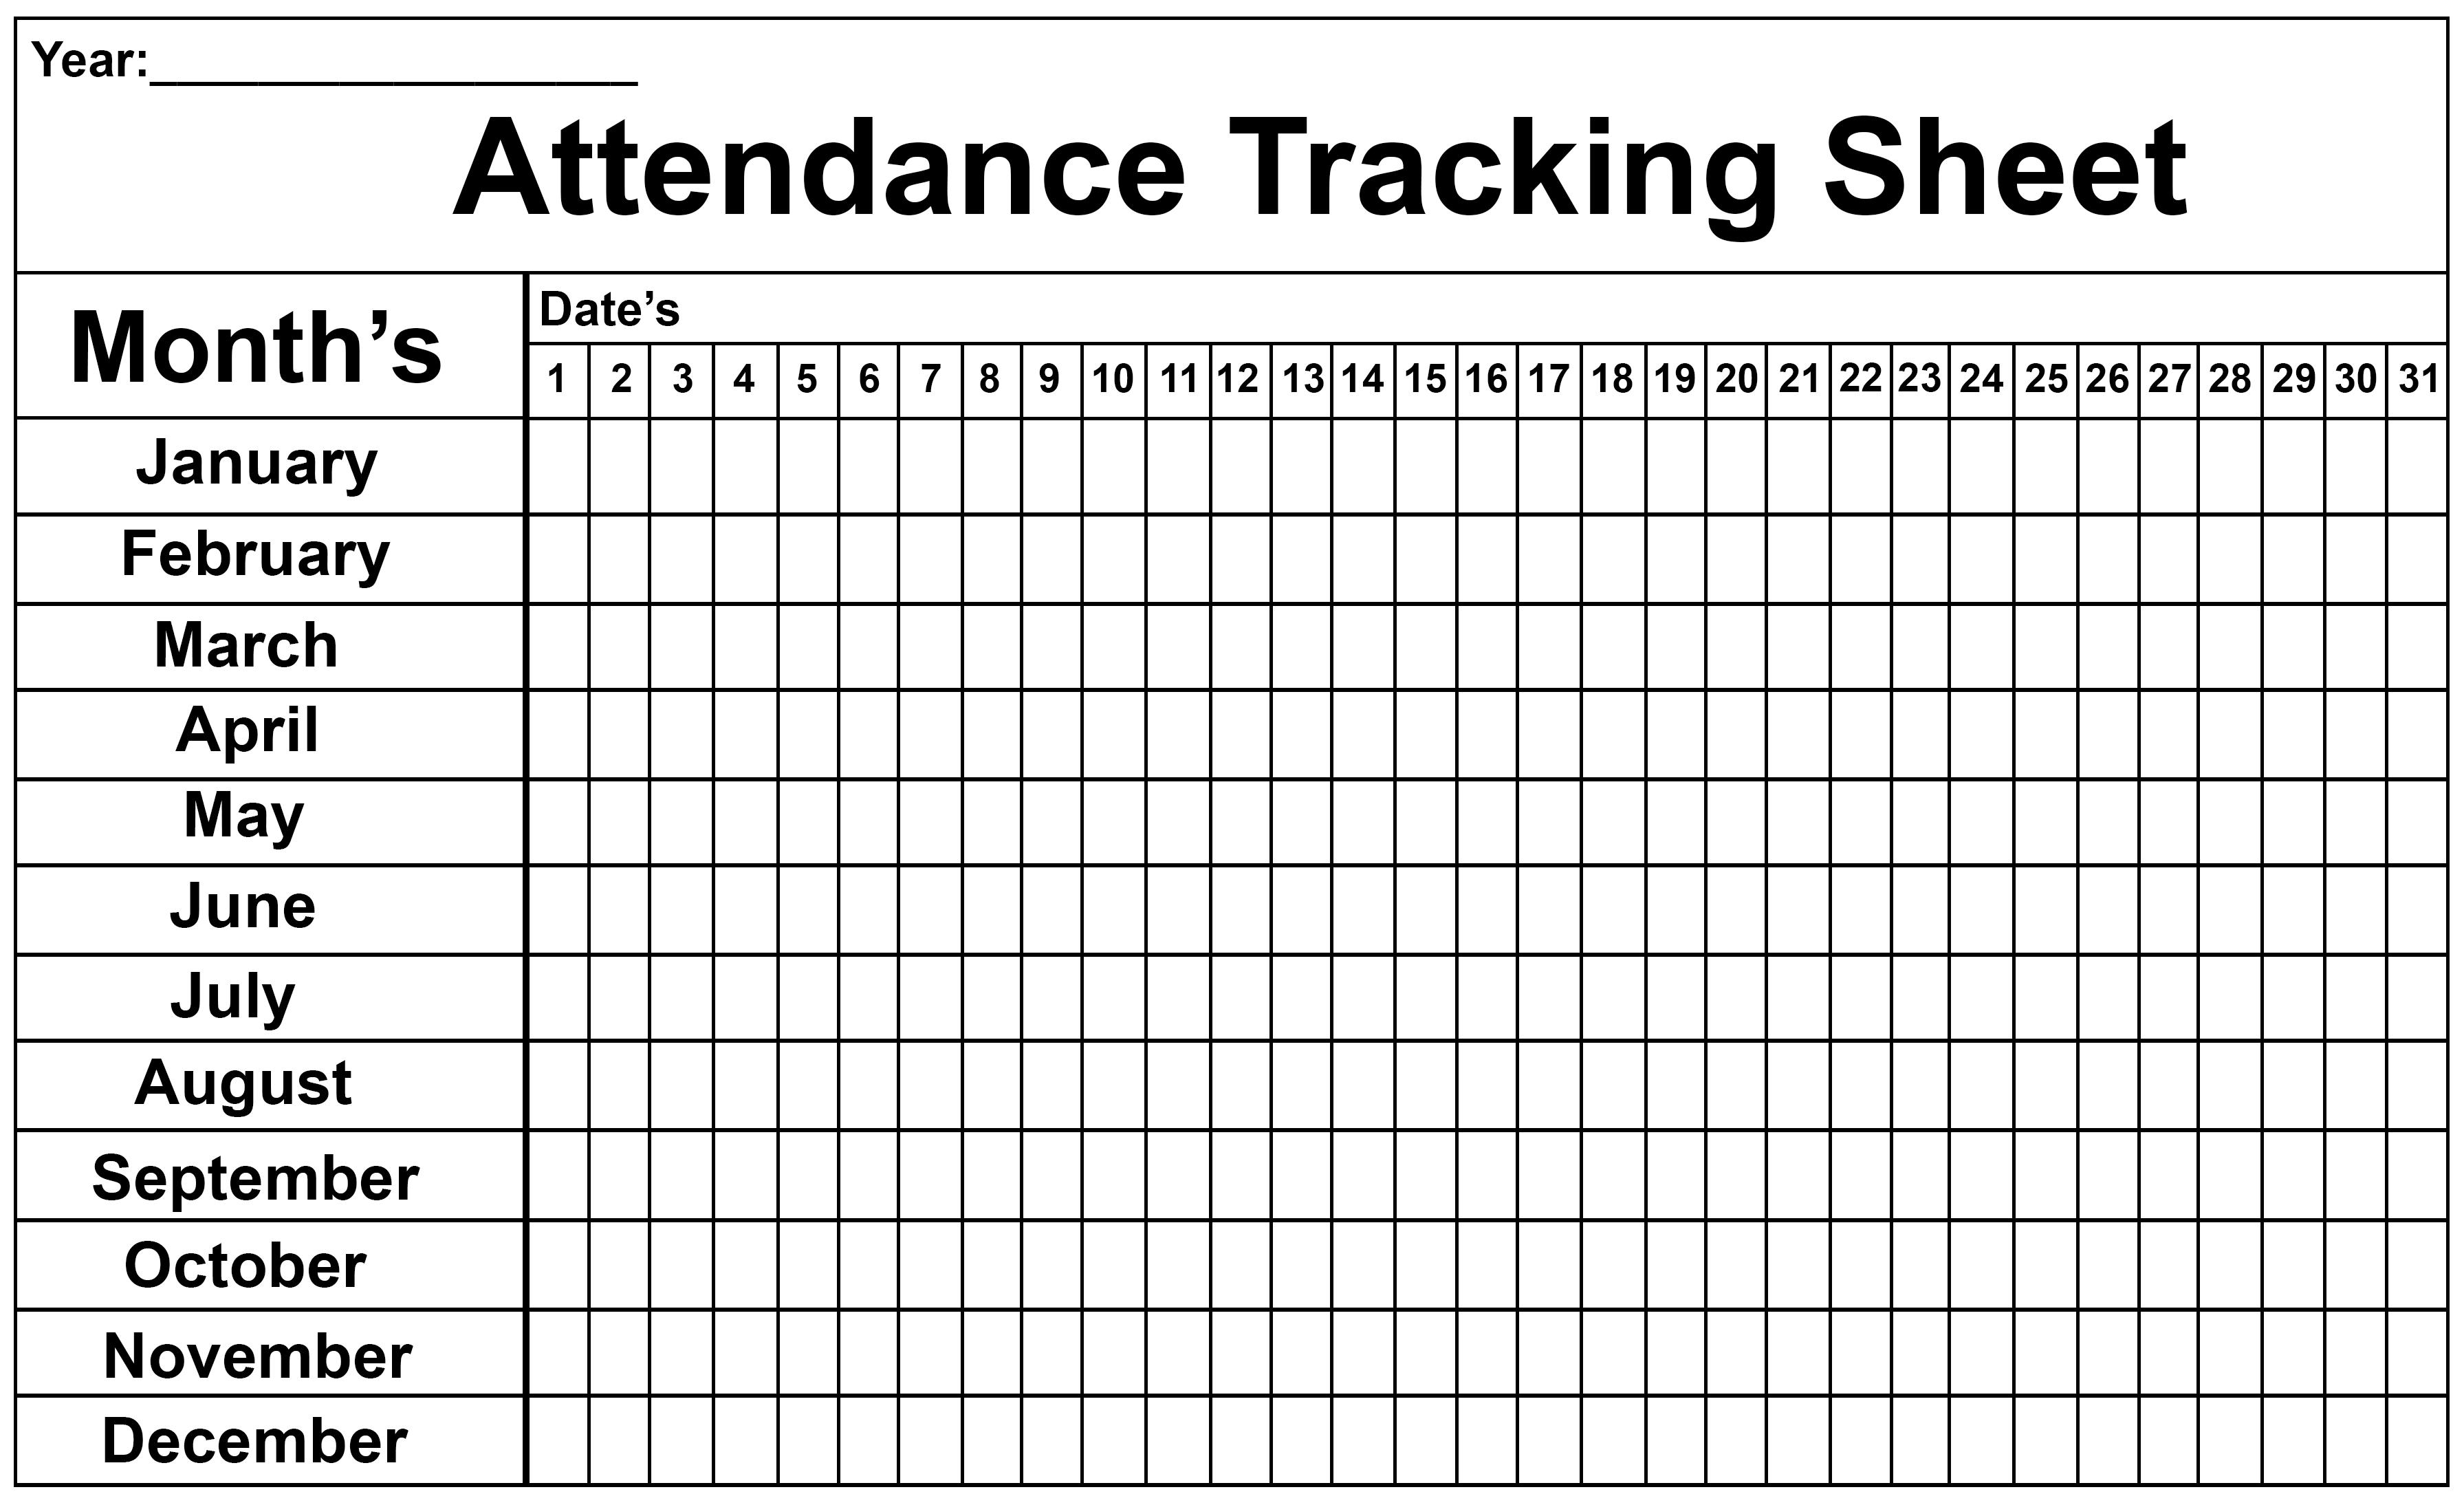 Employee Attendance Tracker Sheet 2019 | Printable Calendar Diy with regard to Excel Lunar Calendar Formula